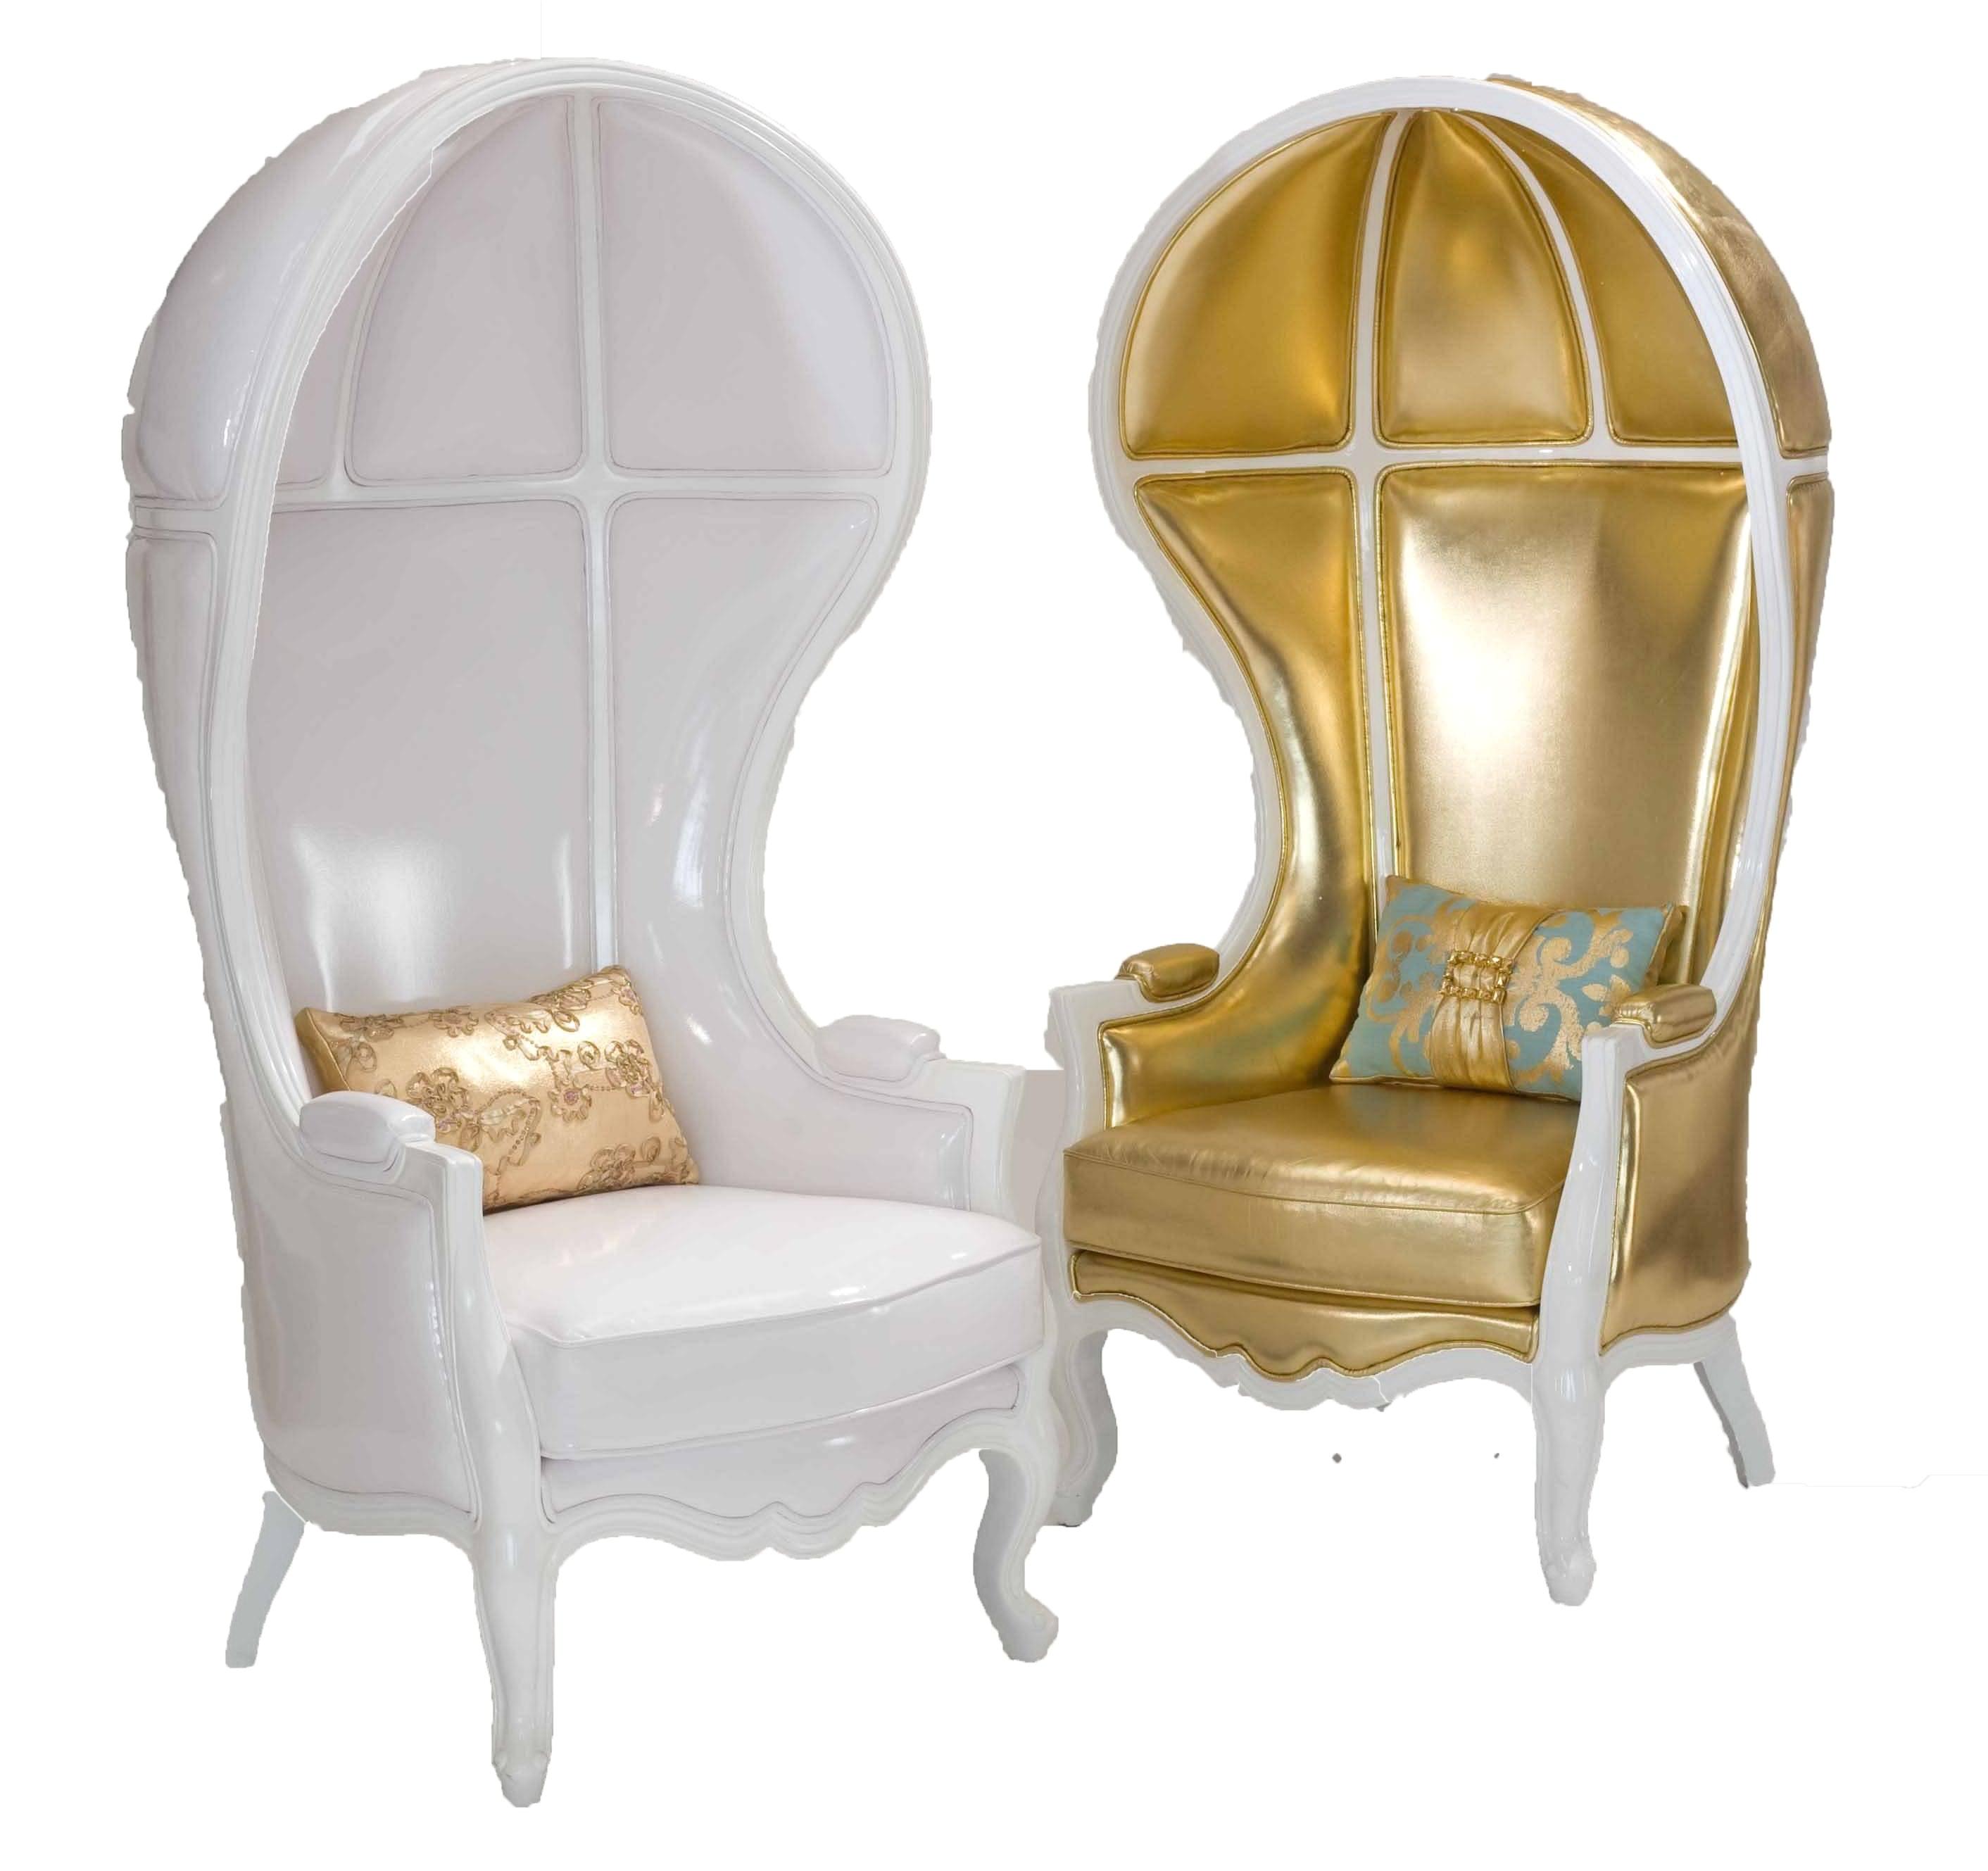 Baby Shower Throne Chair Rental Brooklyn Baby Shower Chair Rental ...